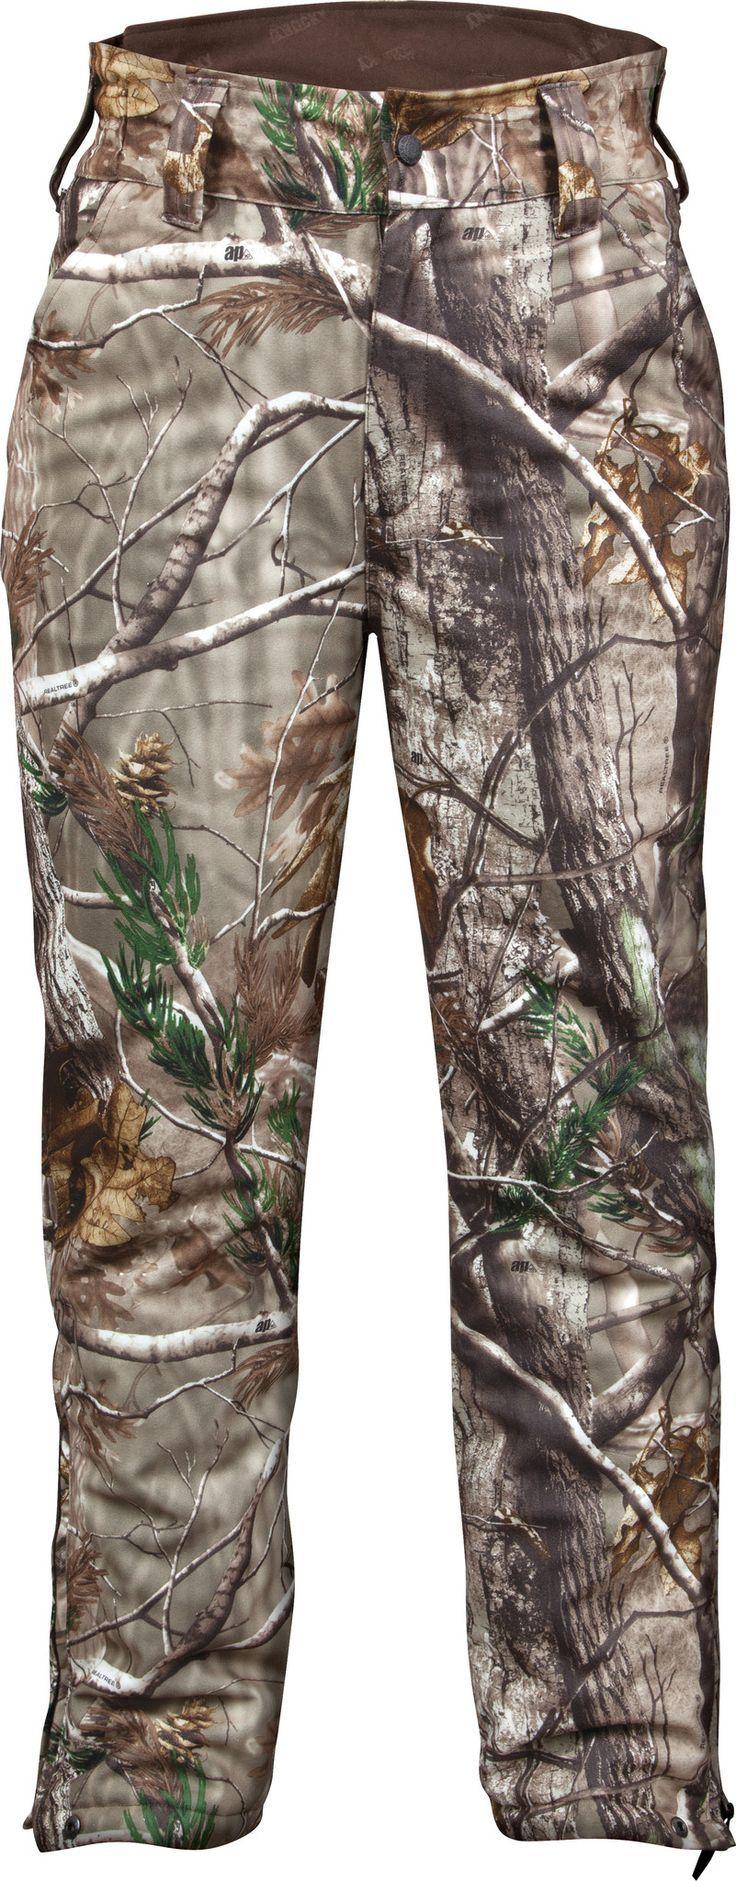 Rocky Prohunter Womens Realtree Waterproof Insulated Camo Hunting Pants